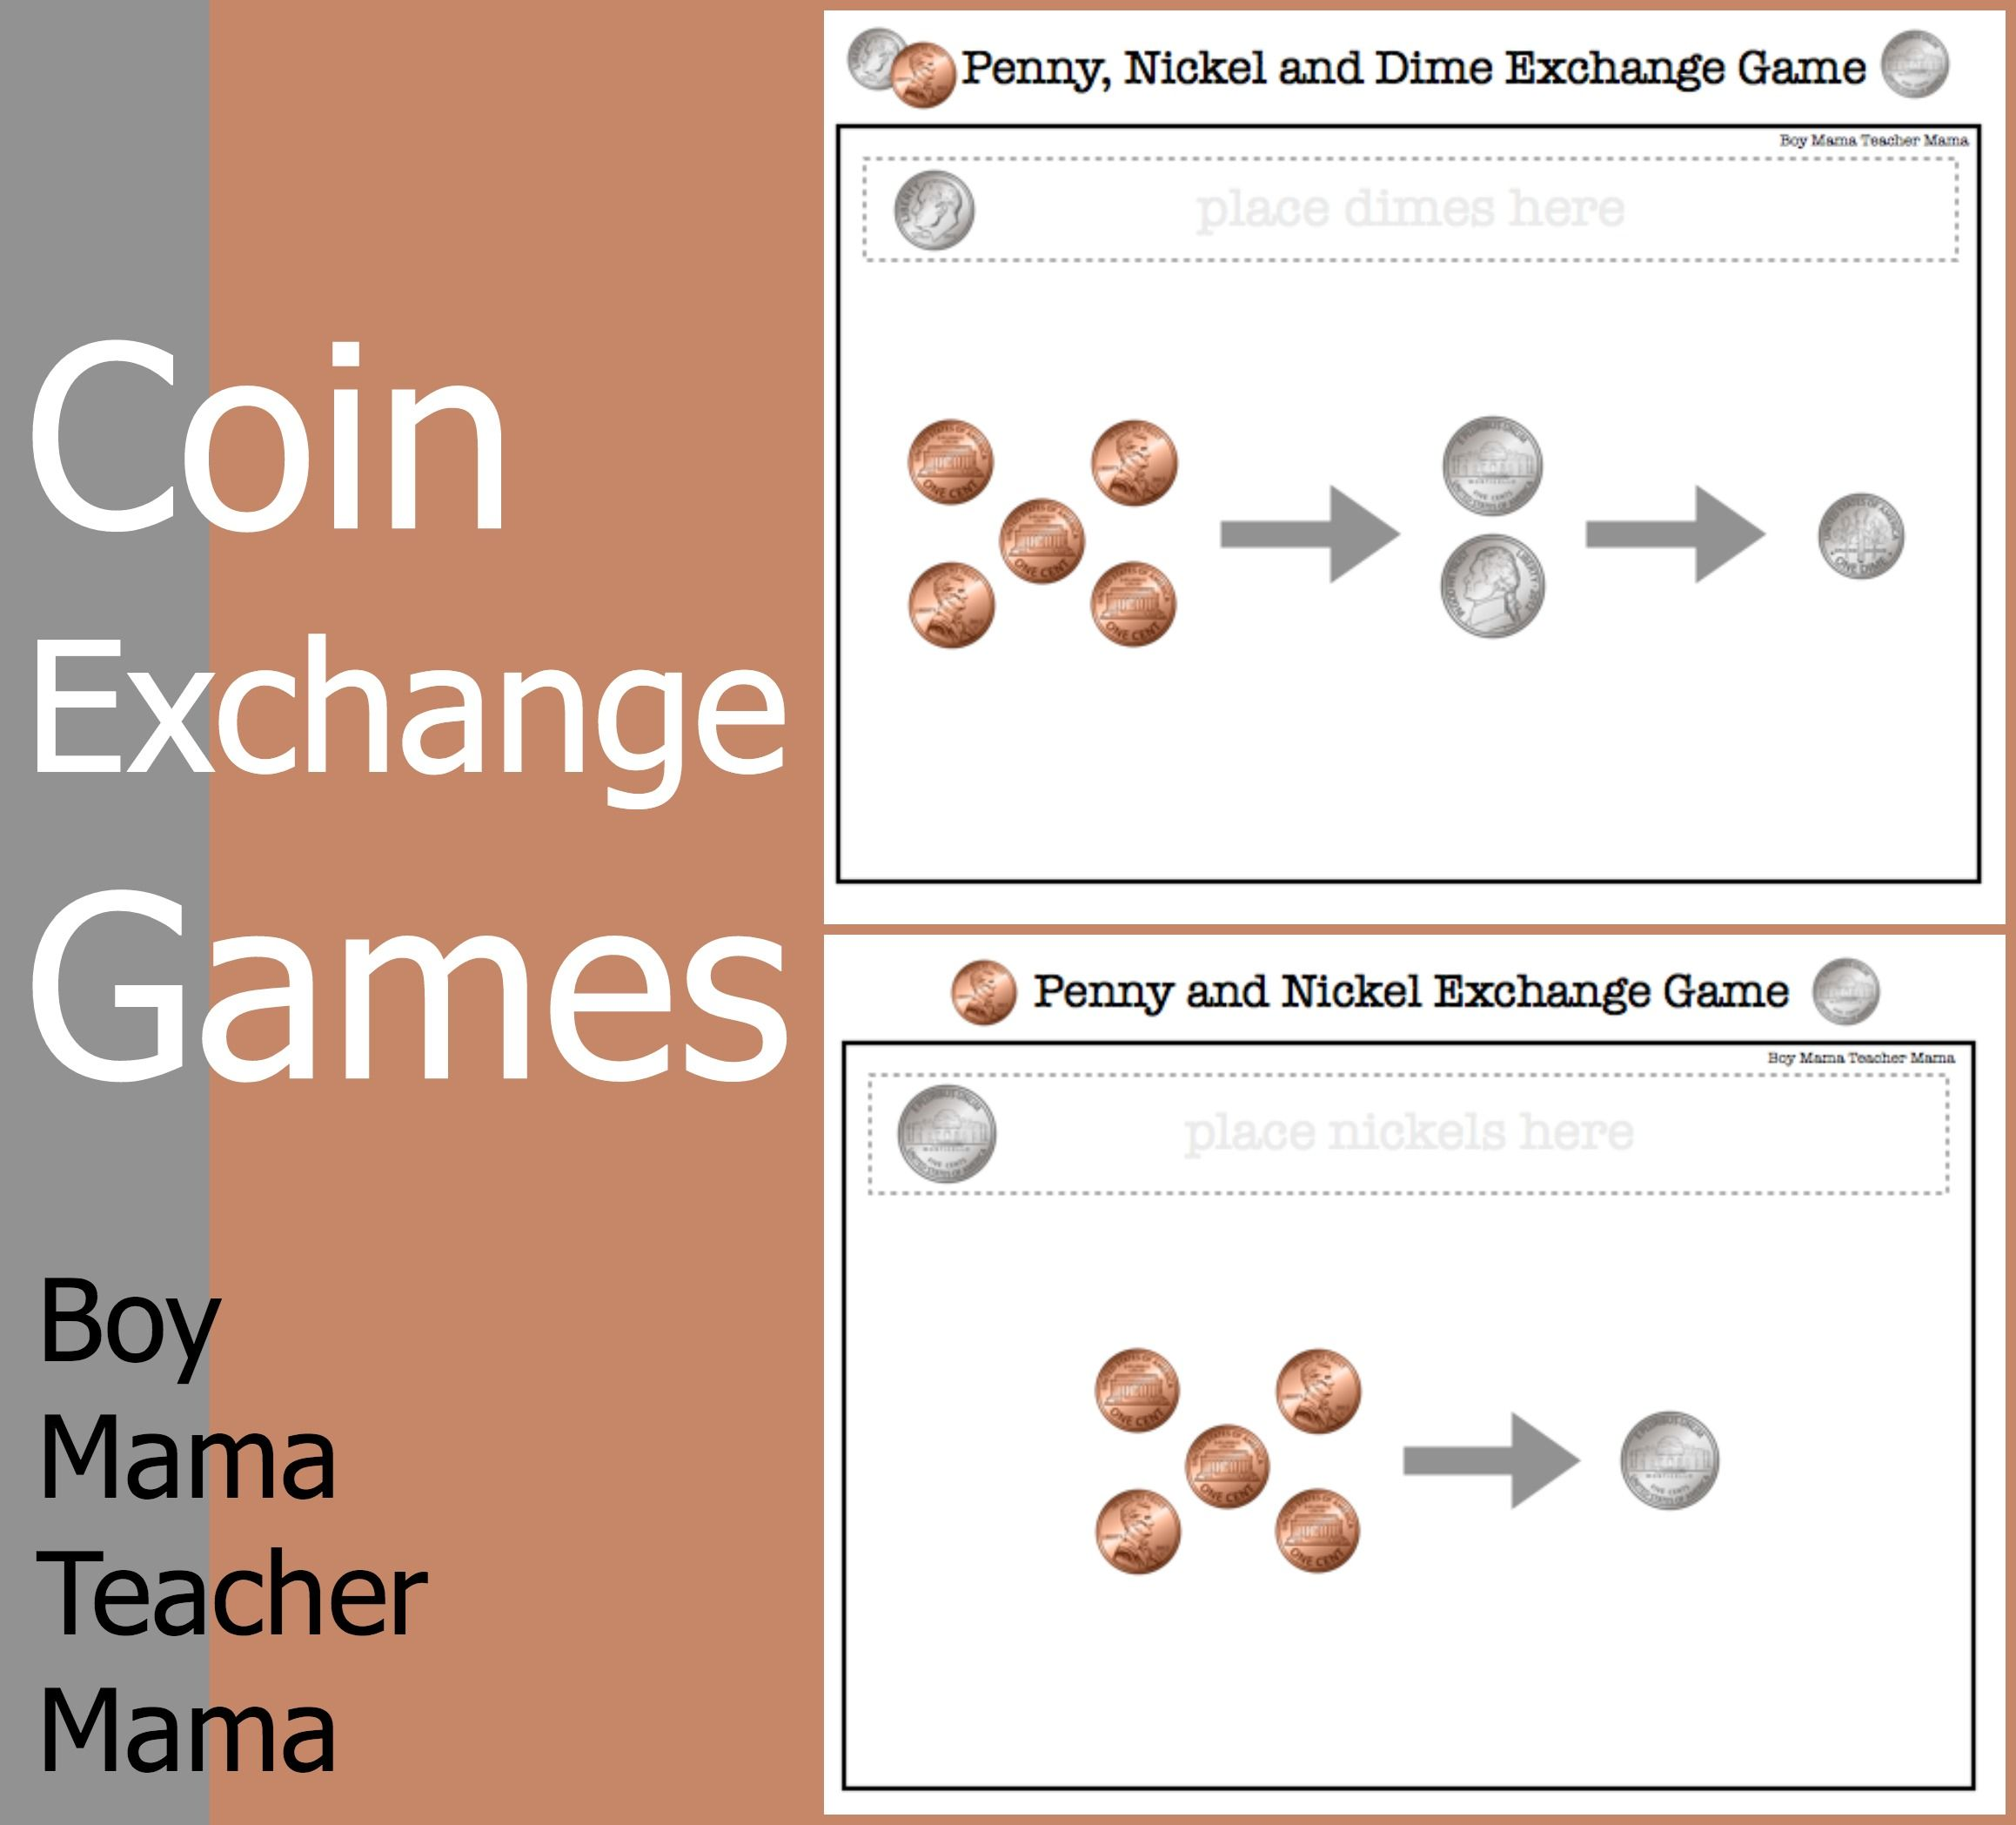 Teacher Mama Coin Exchange Games